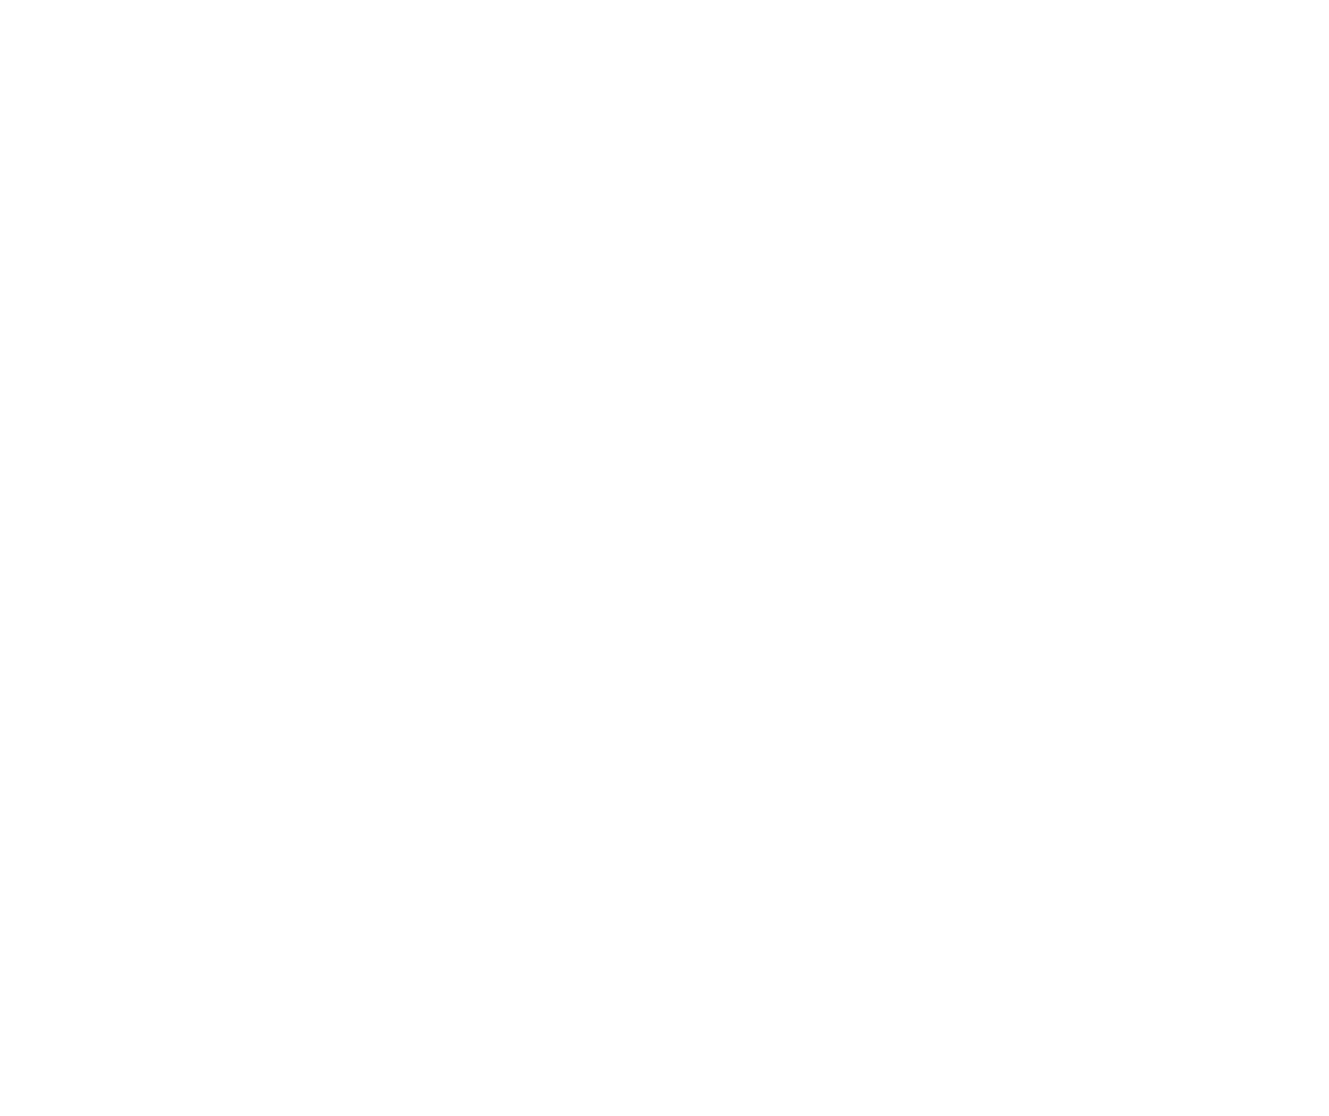 The Lash Co